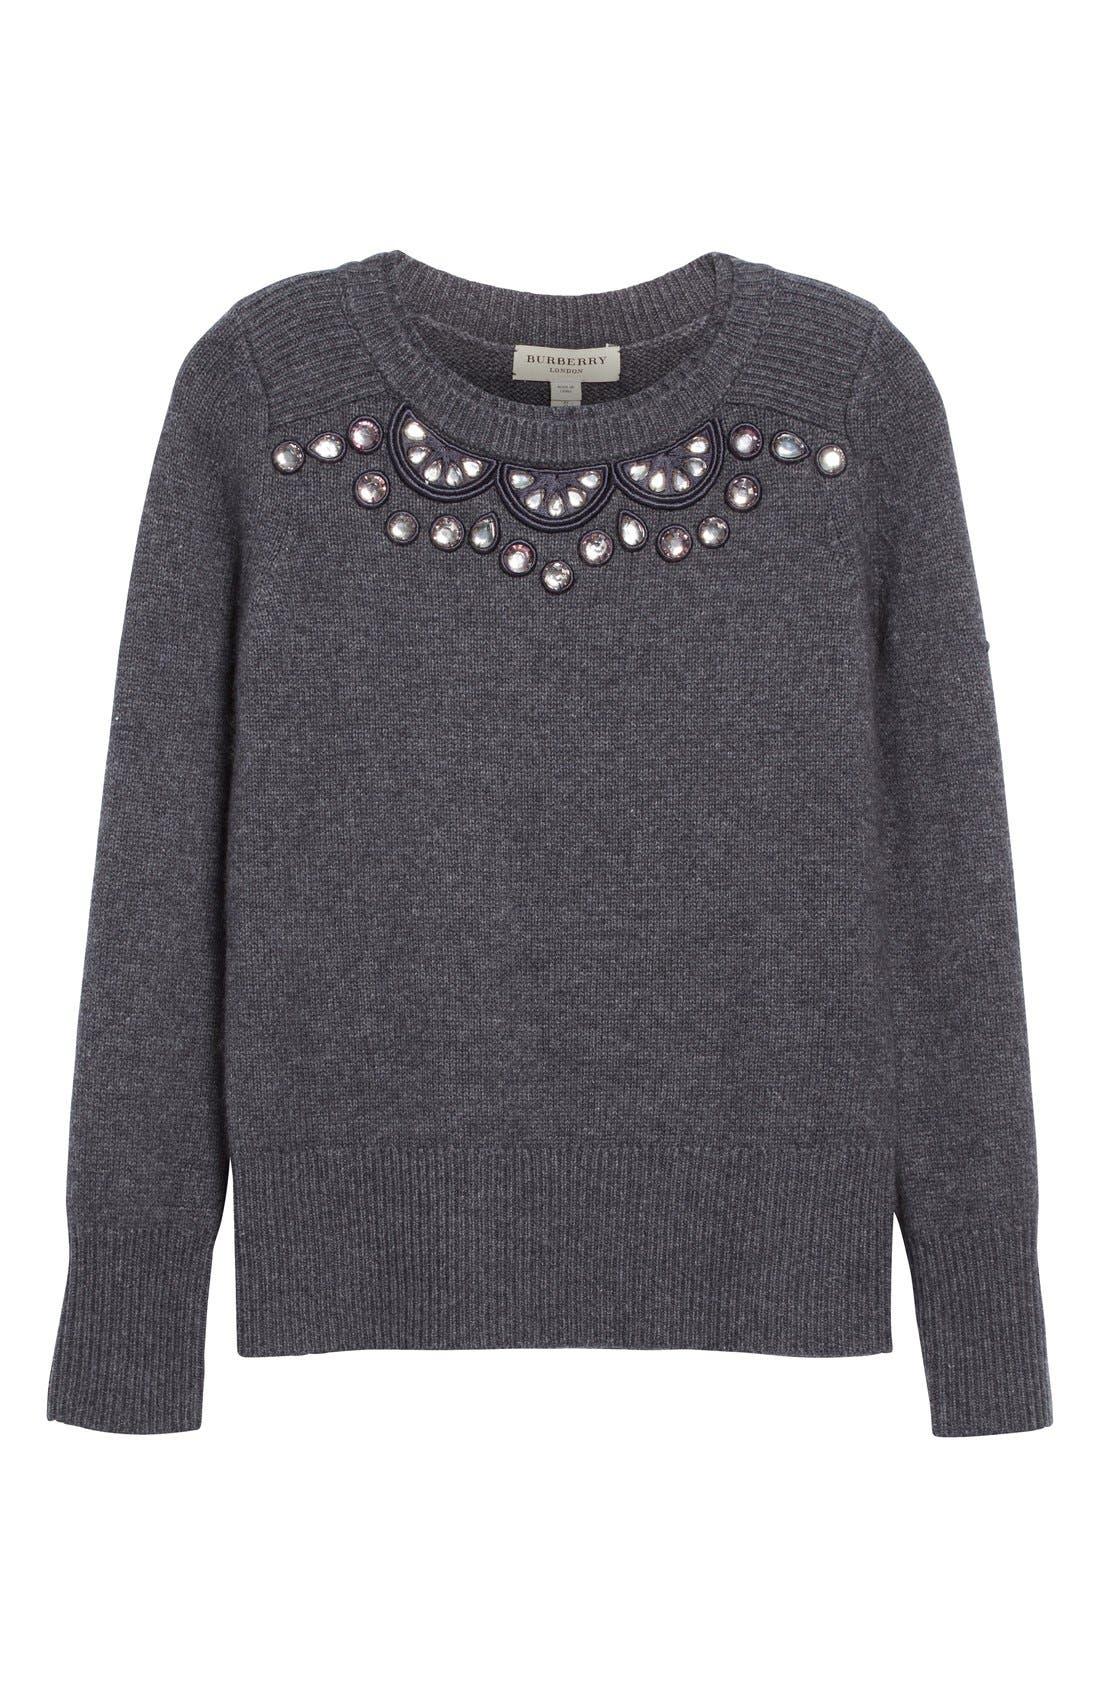 BURBERRY LONDON,                             Embellished Crewneck Sweater,                             Alternate thumbnail 6, color,                             026